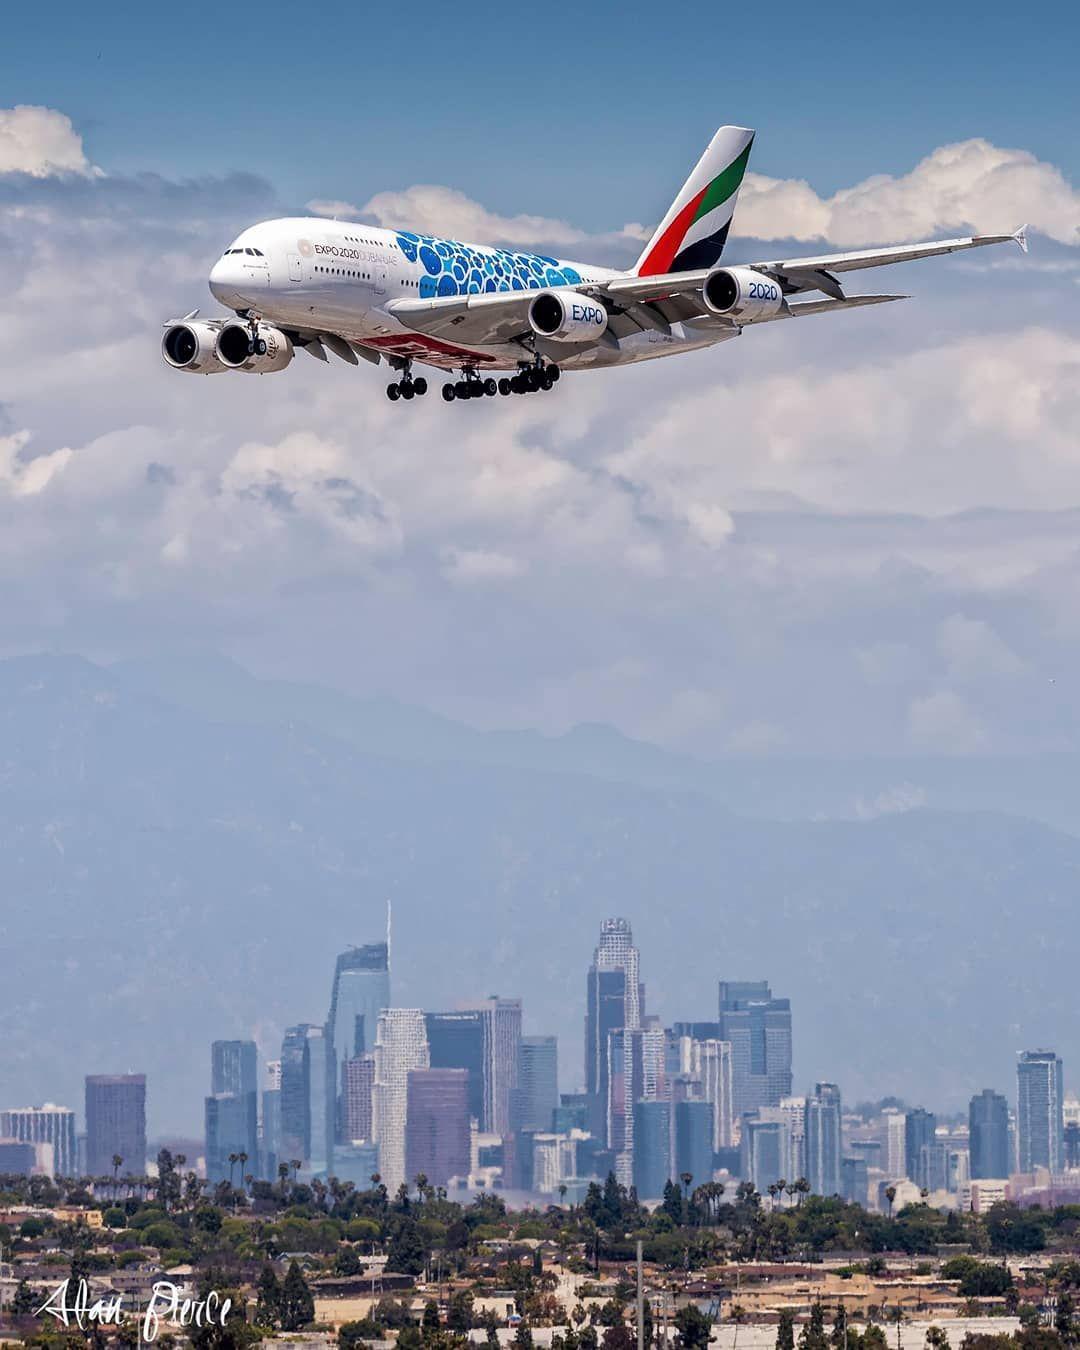 Emirates A6 Eoc A380 800 Lax Los Angeles Emirates A380 Bigplanes Los Angeles International Airport Los Angeles Emirates